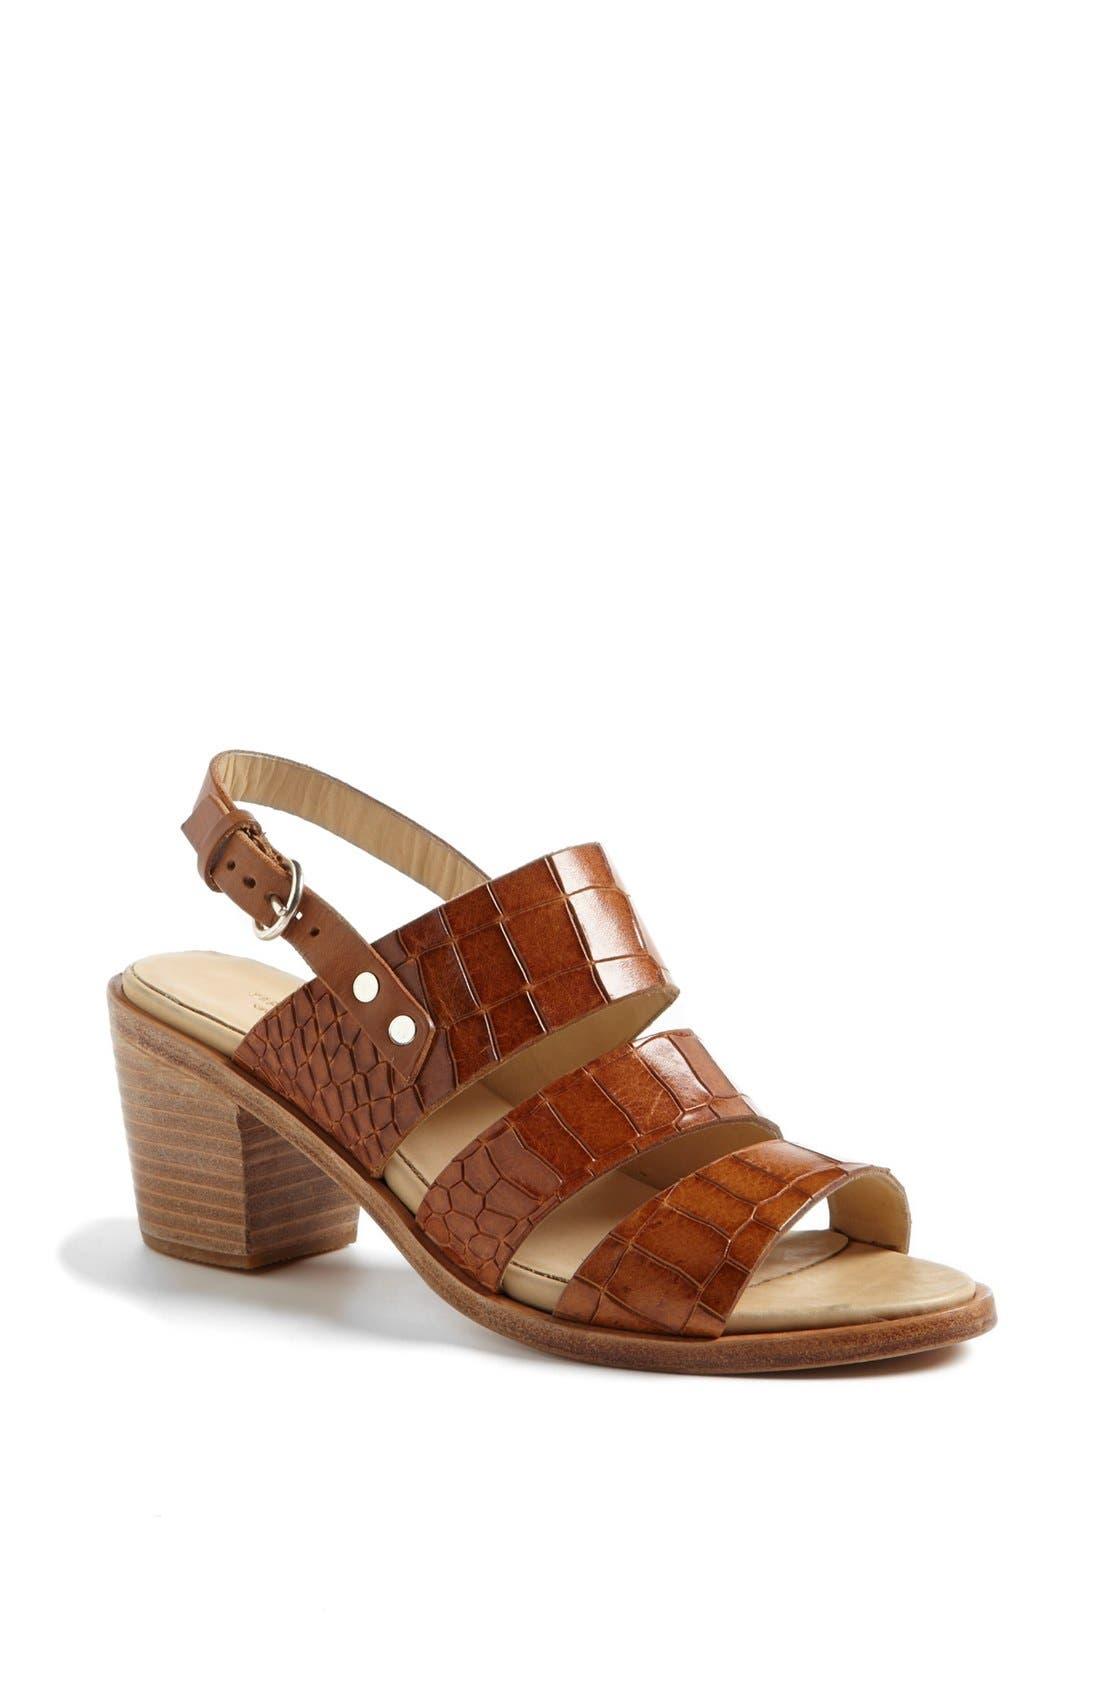 Alternate Image 1 Selected - rag & bone 'Folsom' Croc Embossed Sandal (Online Only)